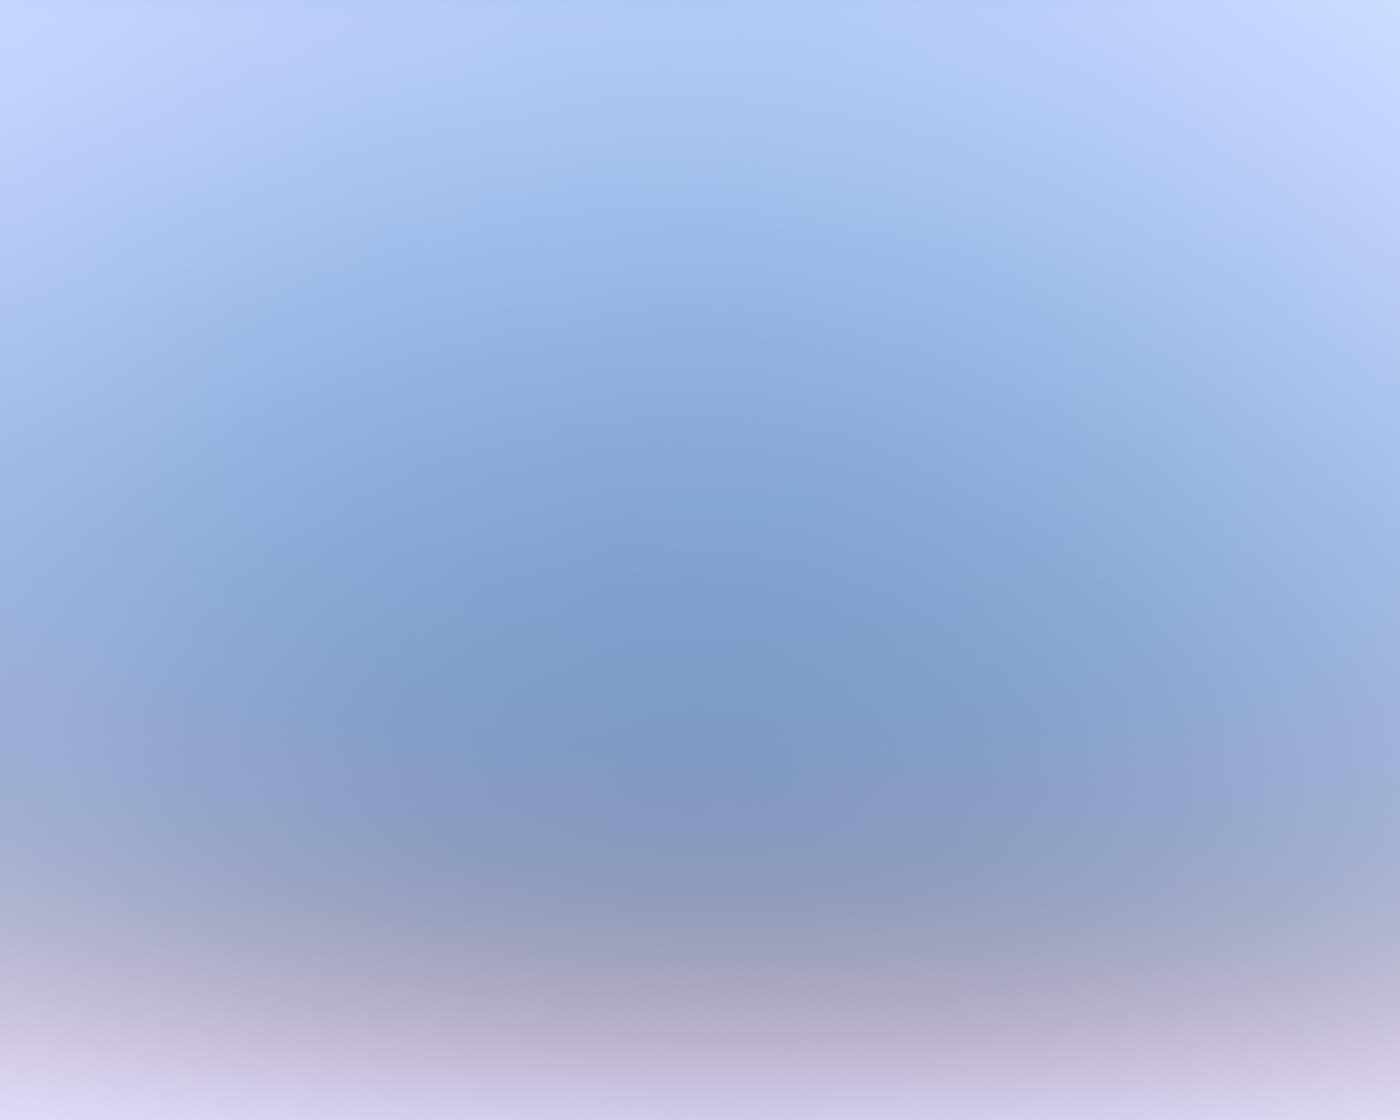 018-aaron-rothman%E2%80%93signal-noise